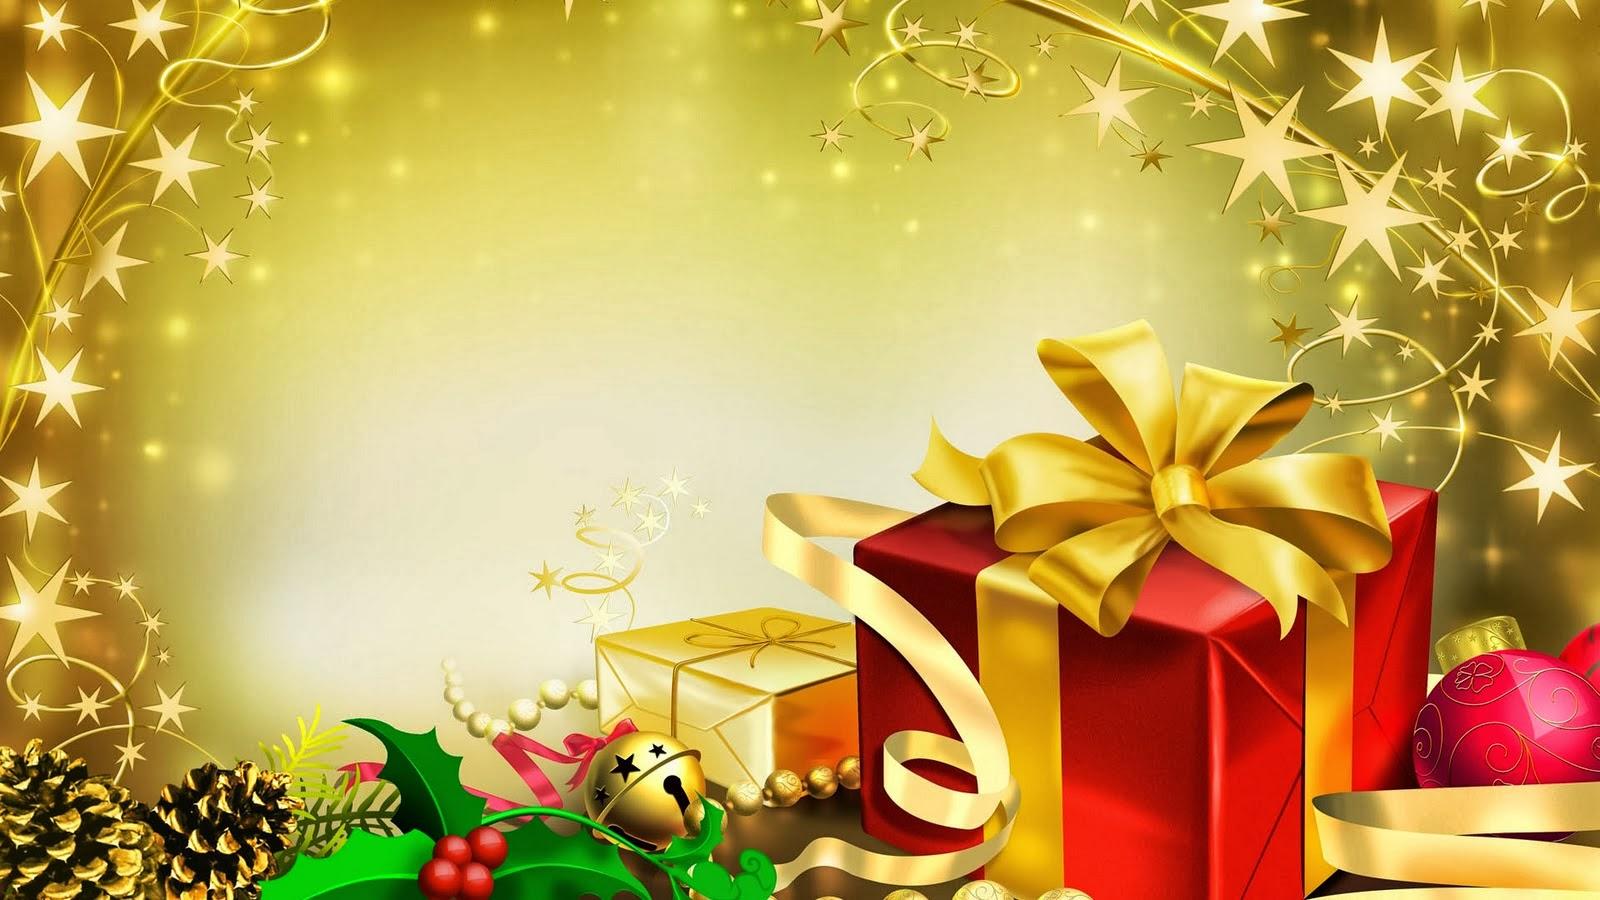 Christmas Wallpapers HD 1080p - WallpaperSafari